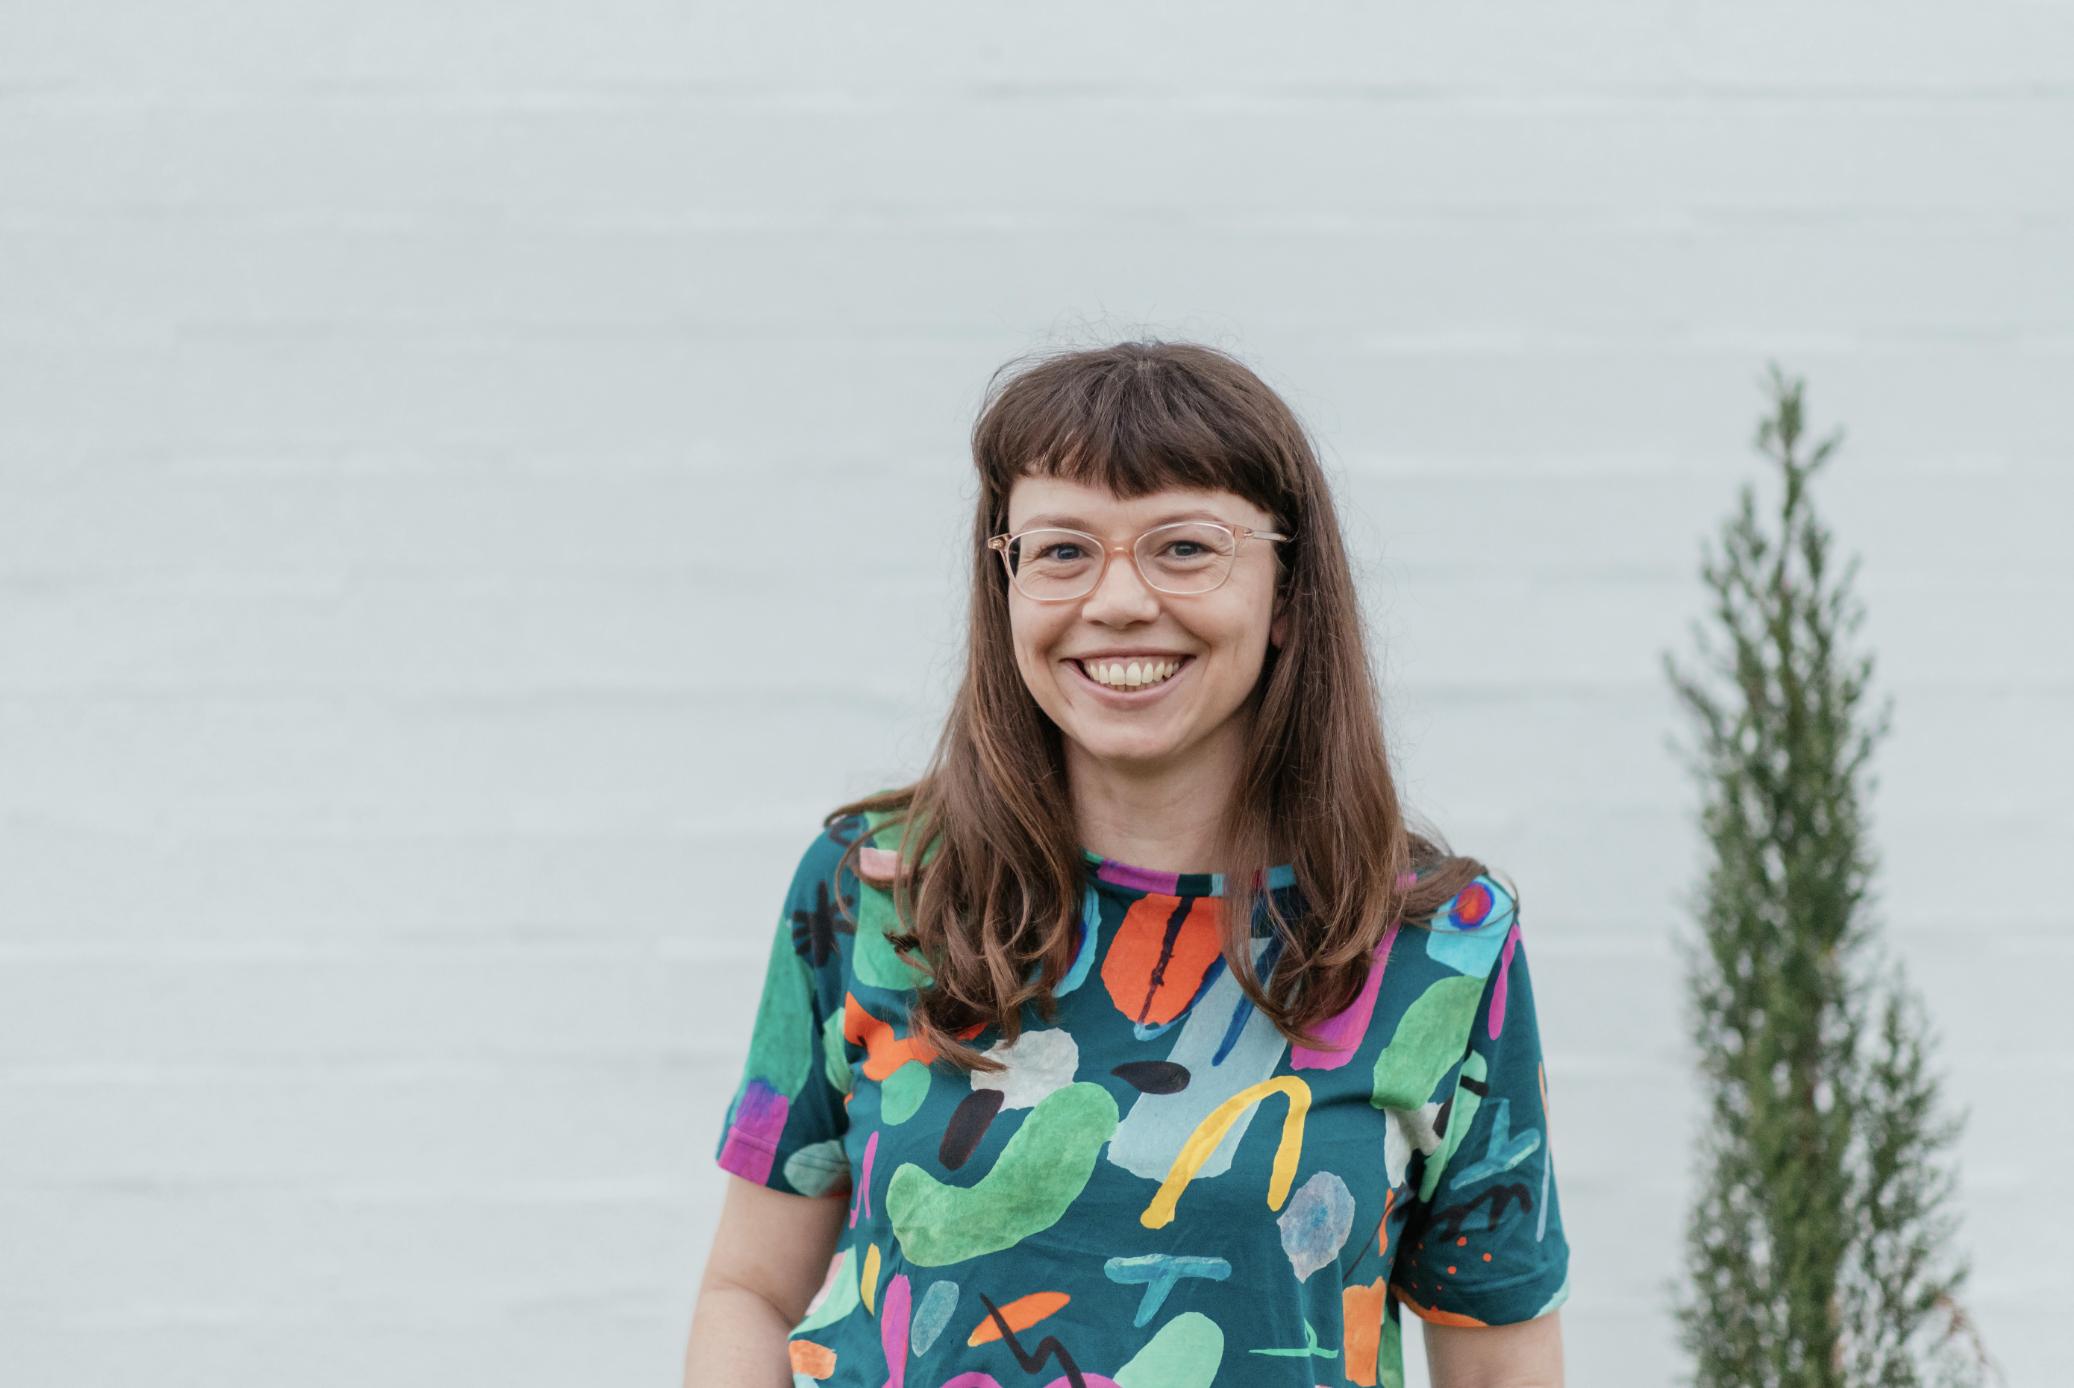 Jessica roberts - Branding Photographer + Lover of Cacti